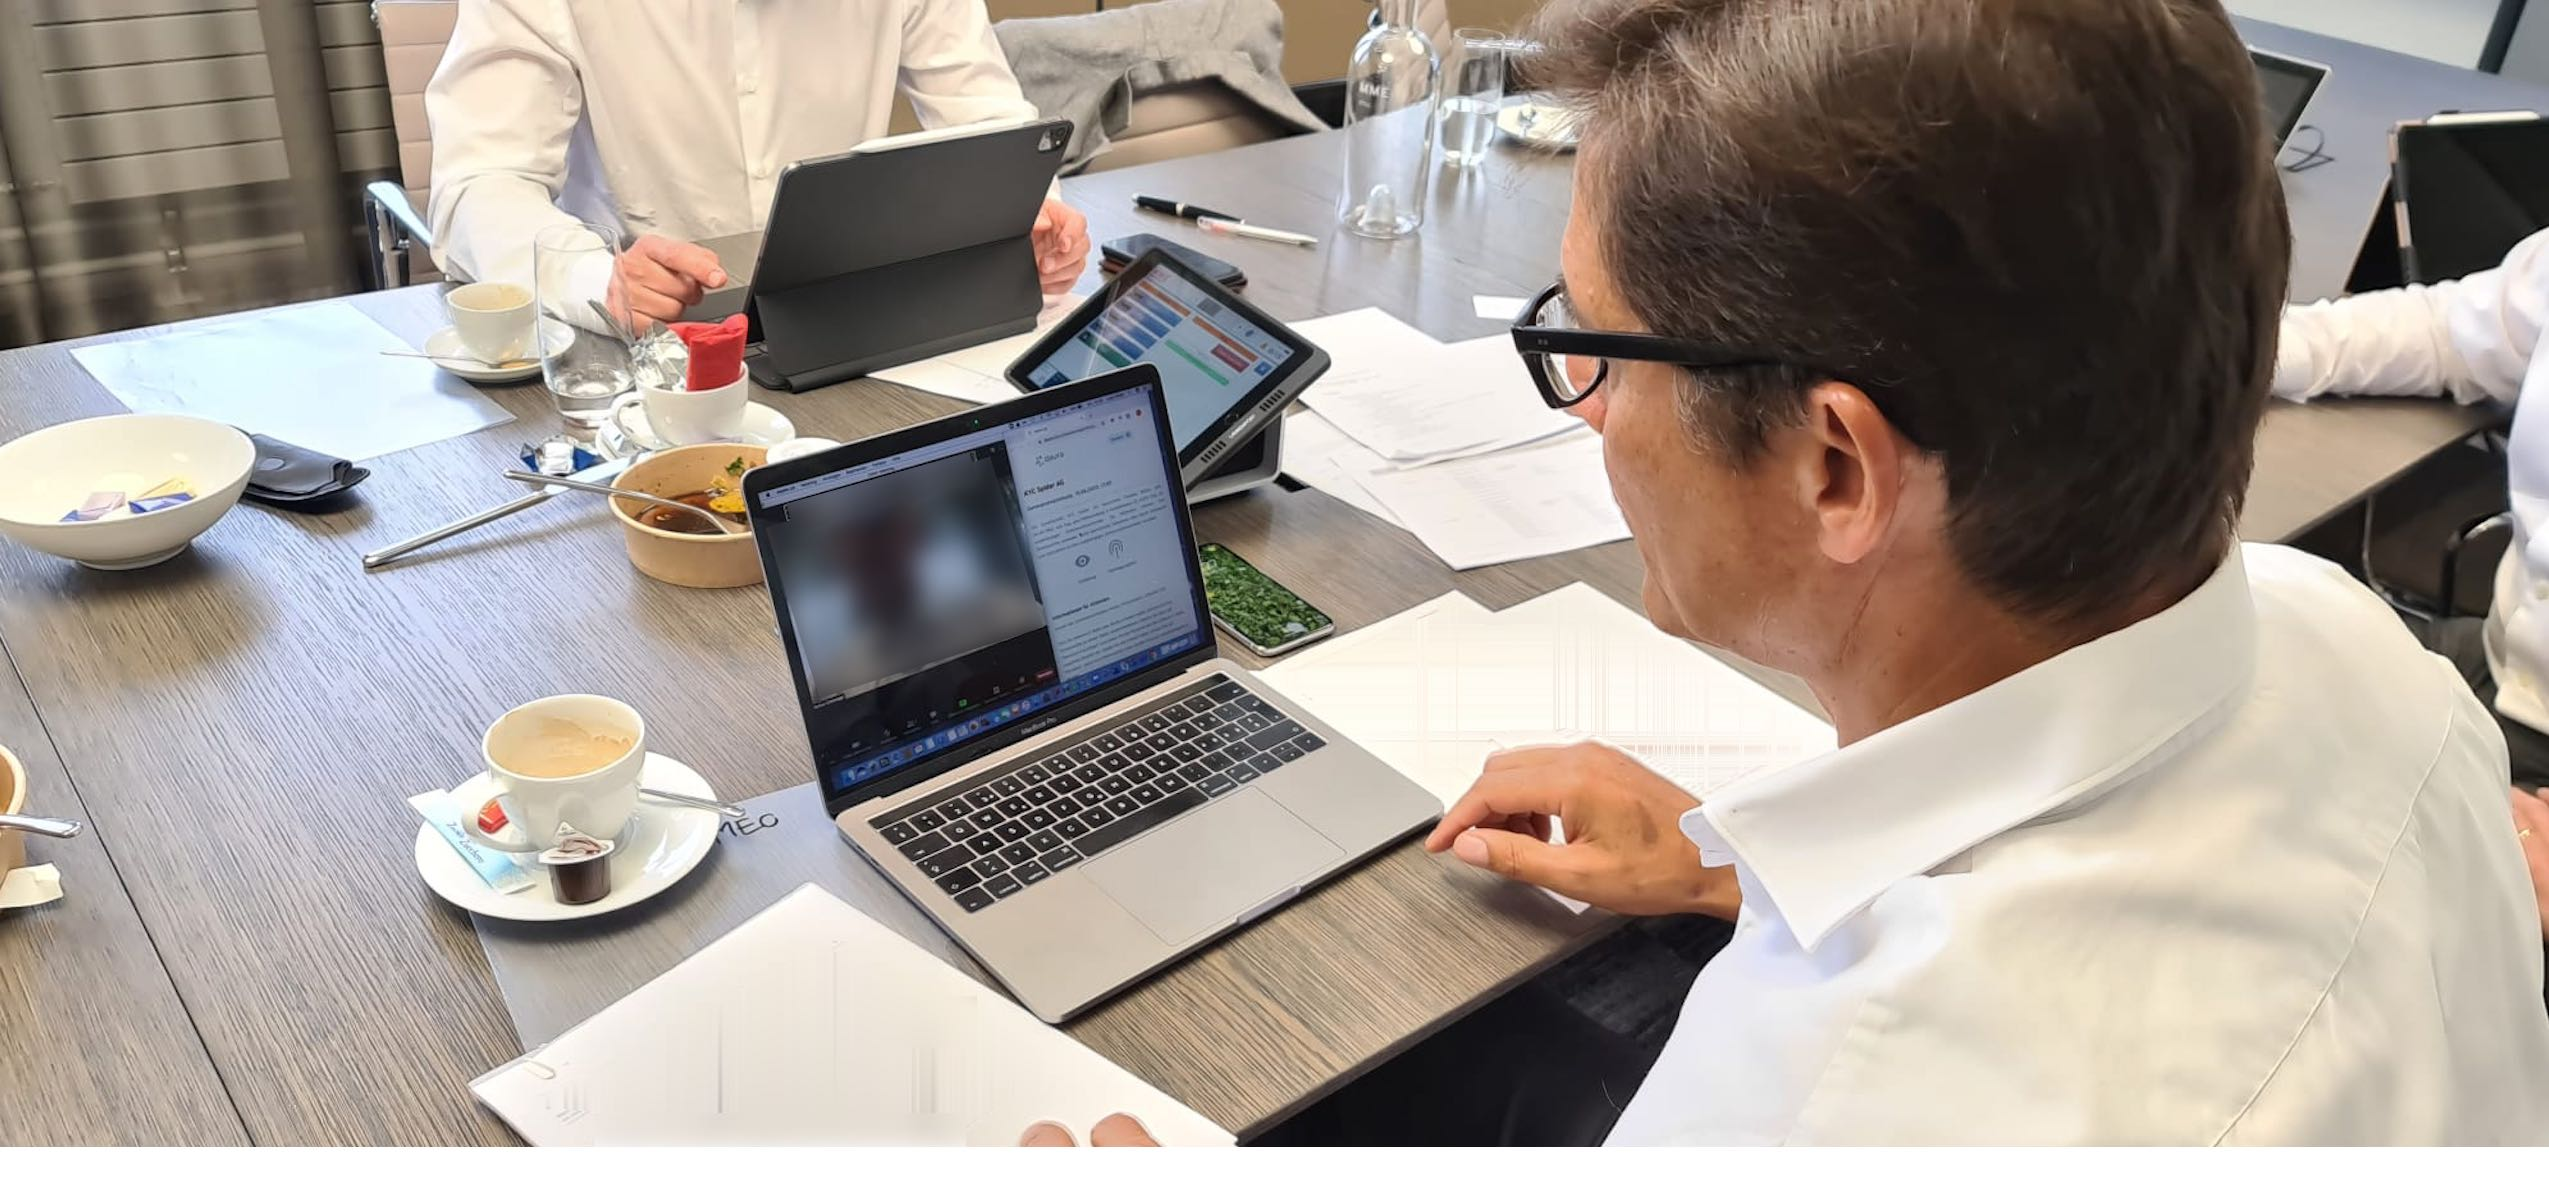 KYC Pilot-User for daura for the digital General Assembly platform